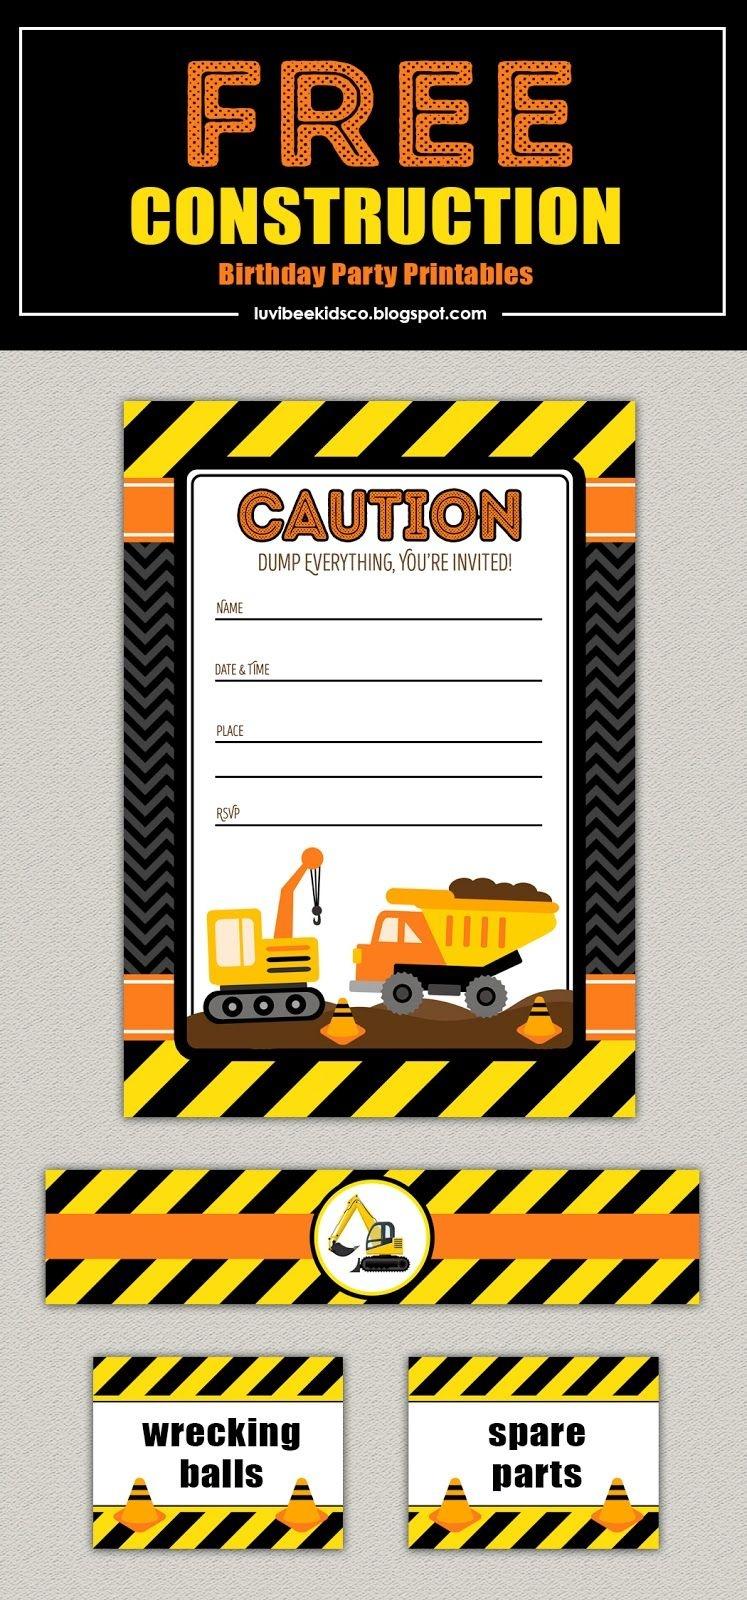 Free Construction Birthday Party Printables. Construction Party - Free Printable Construction Birthday Invitation Templates